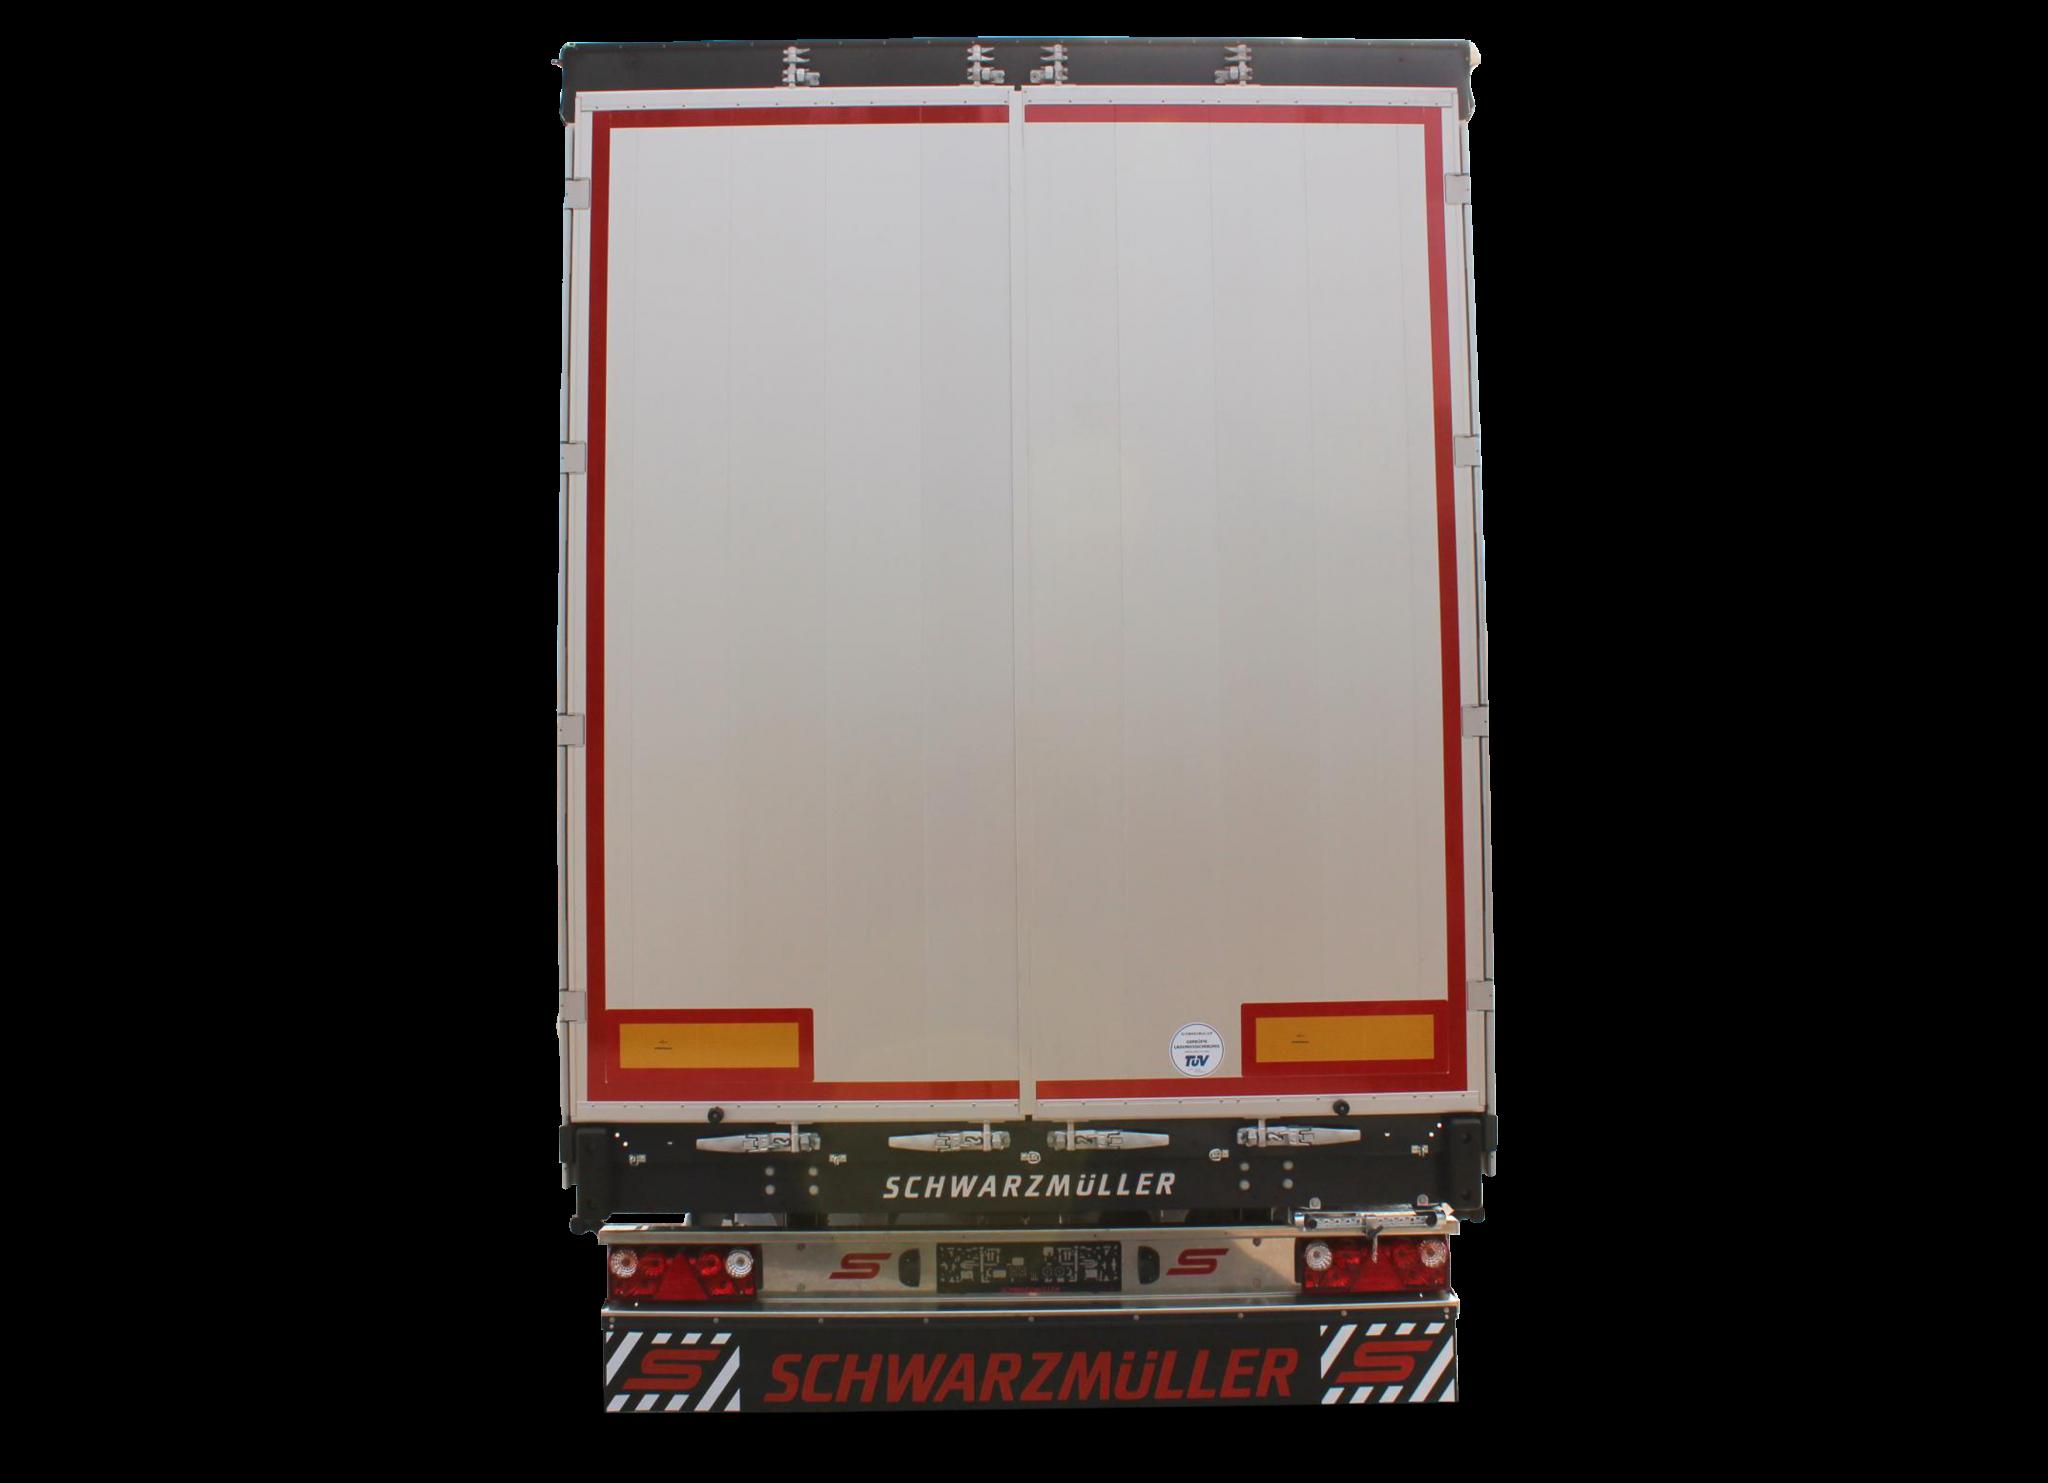 3-axle large-scale ultralight sliding tarpaulin platform semitrailer